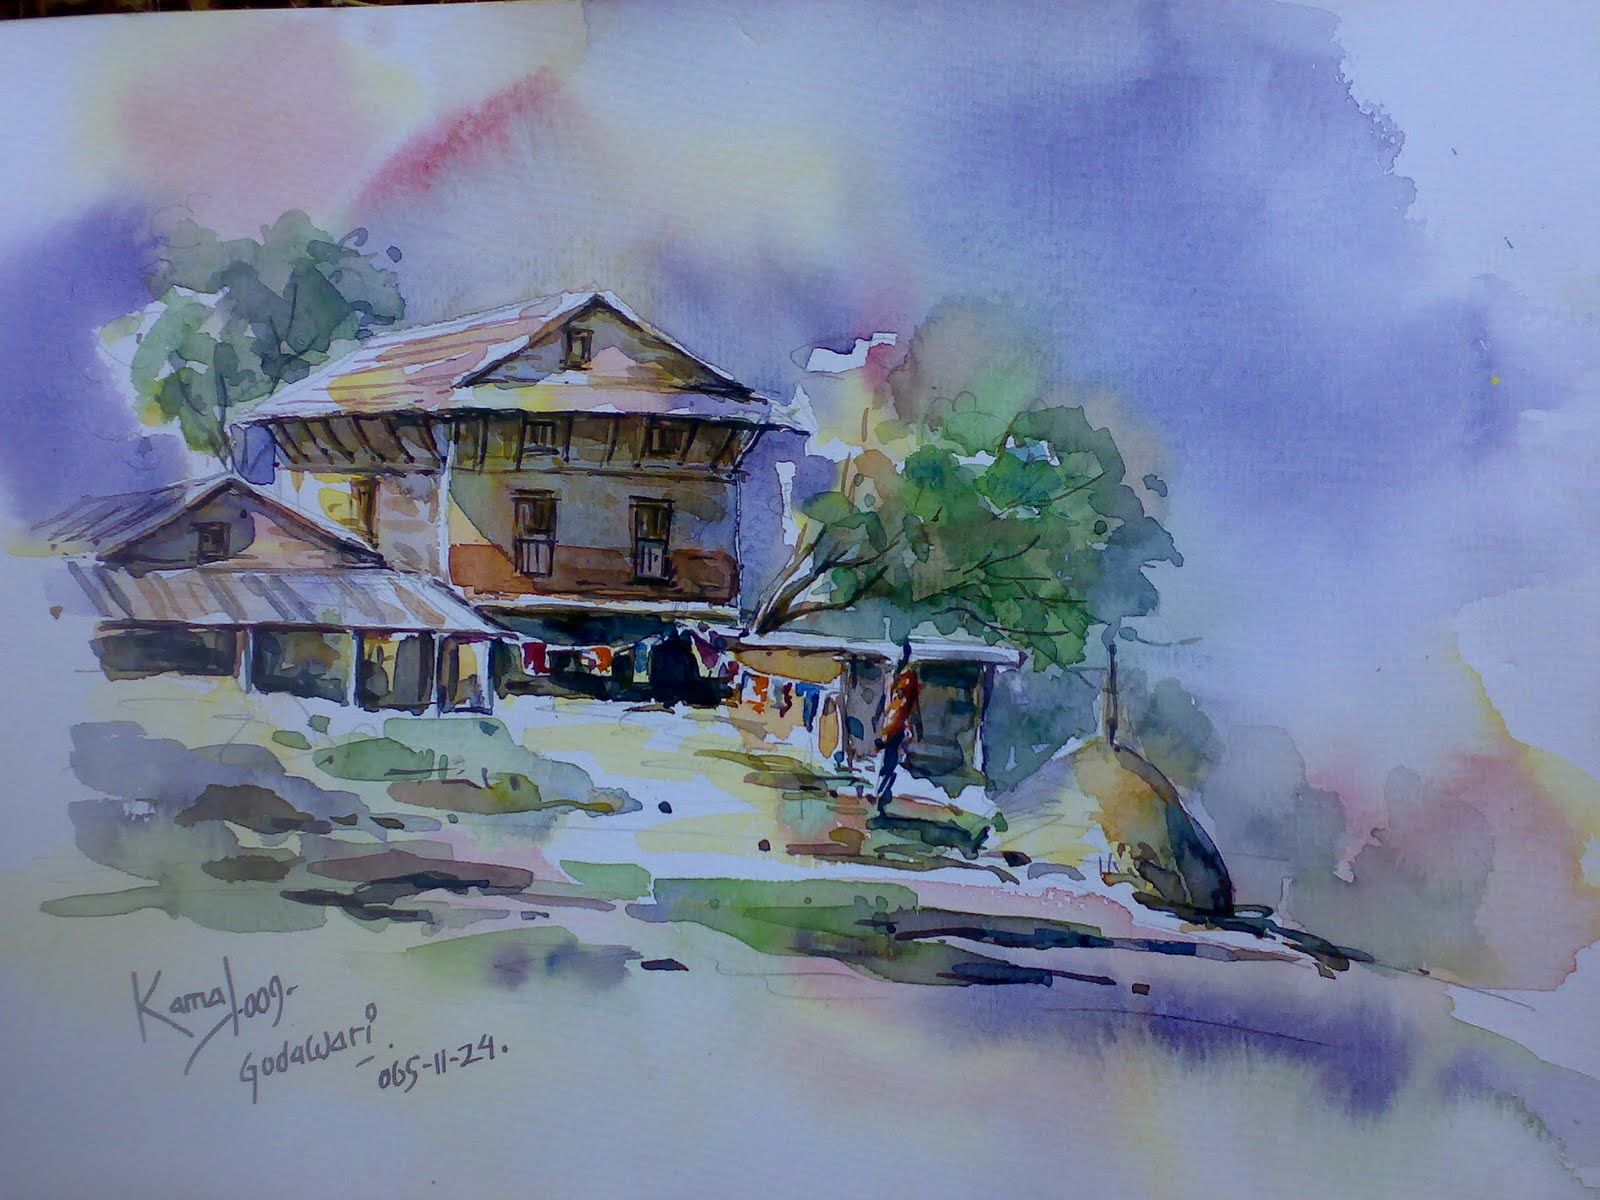 art and paintings by kamal gurung lalitkala fine art campus kathmandu